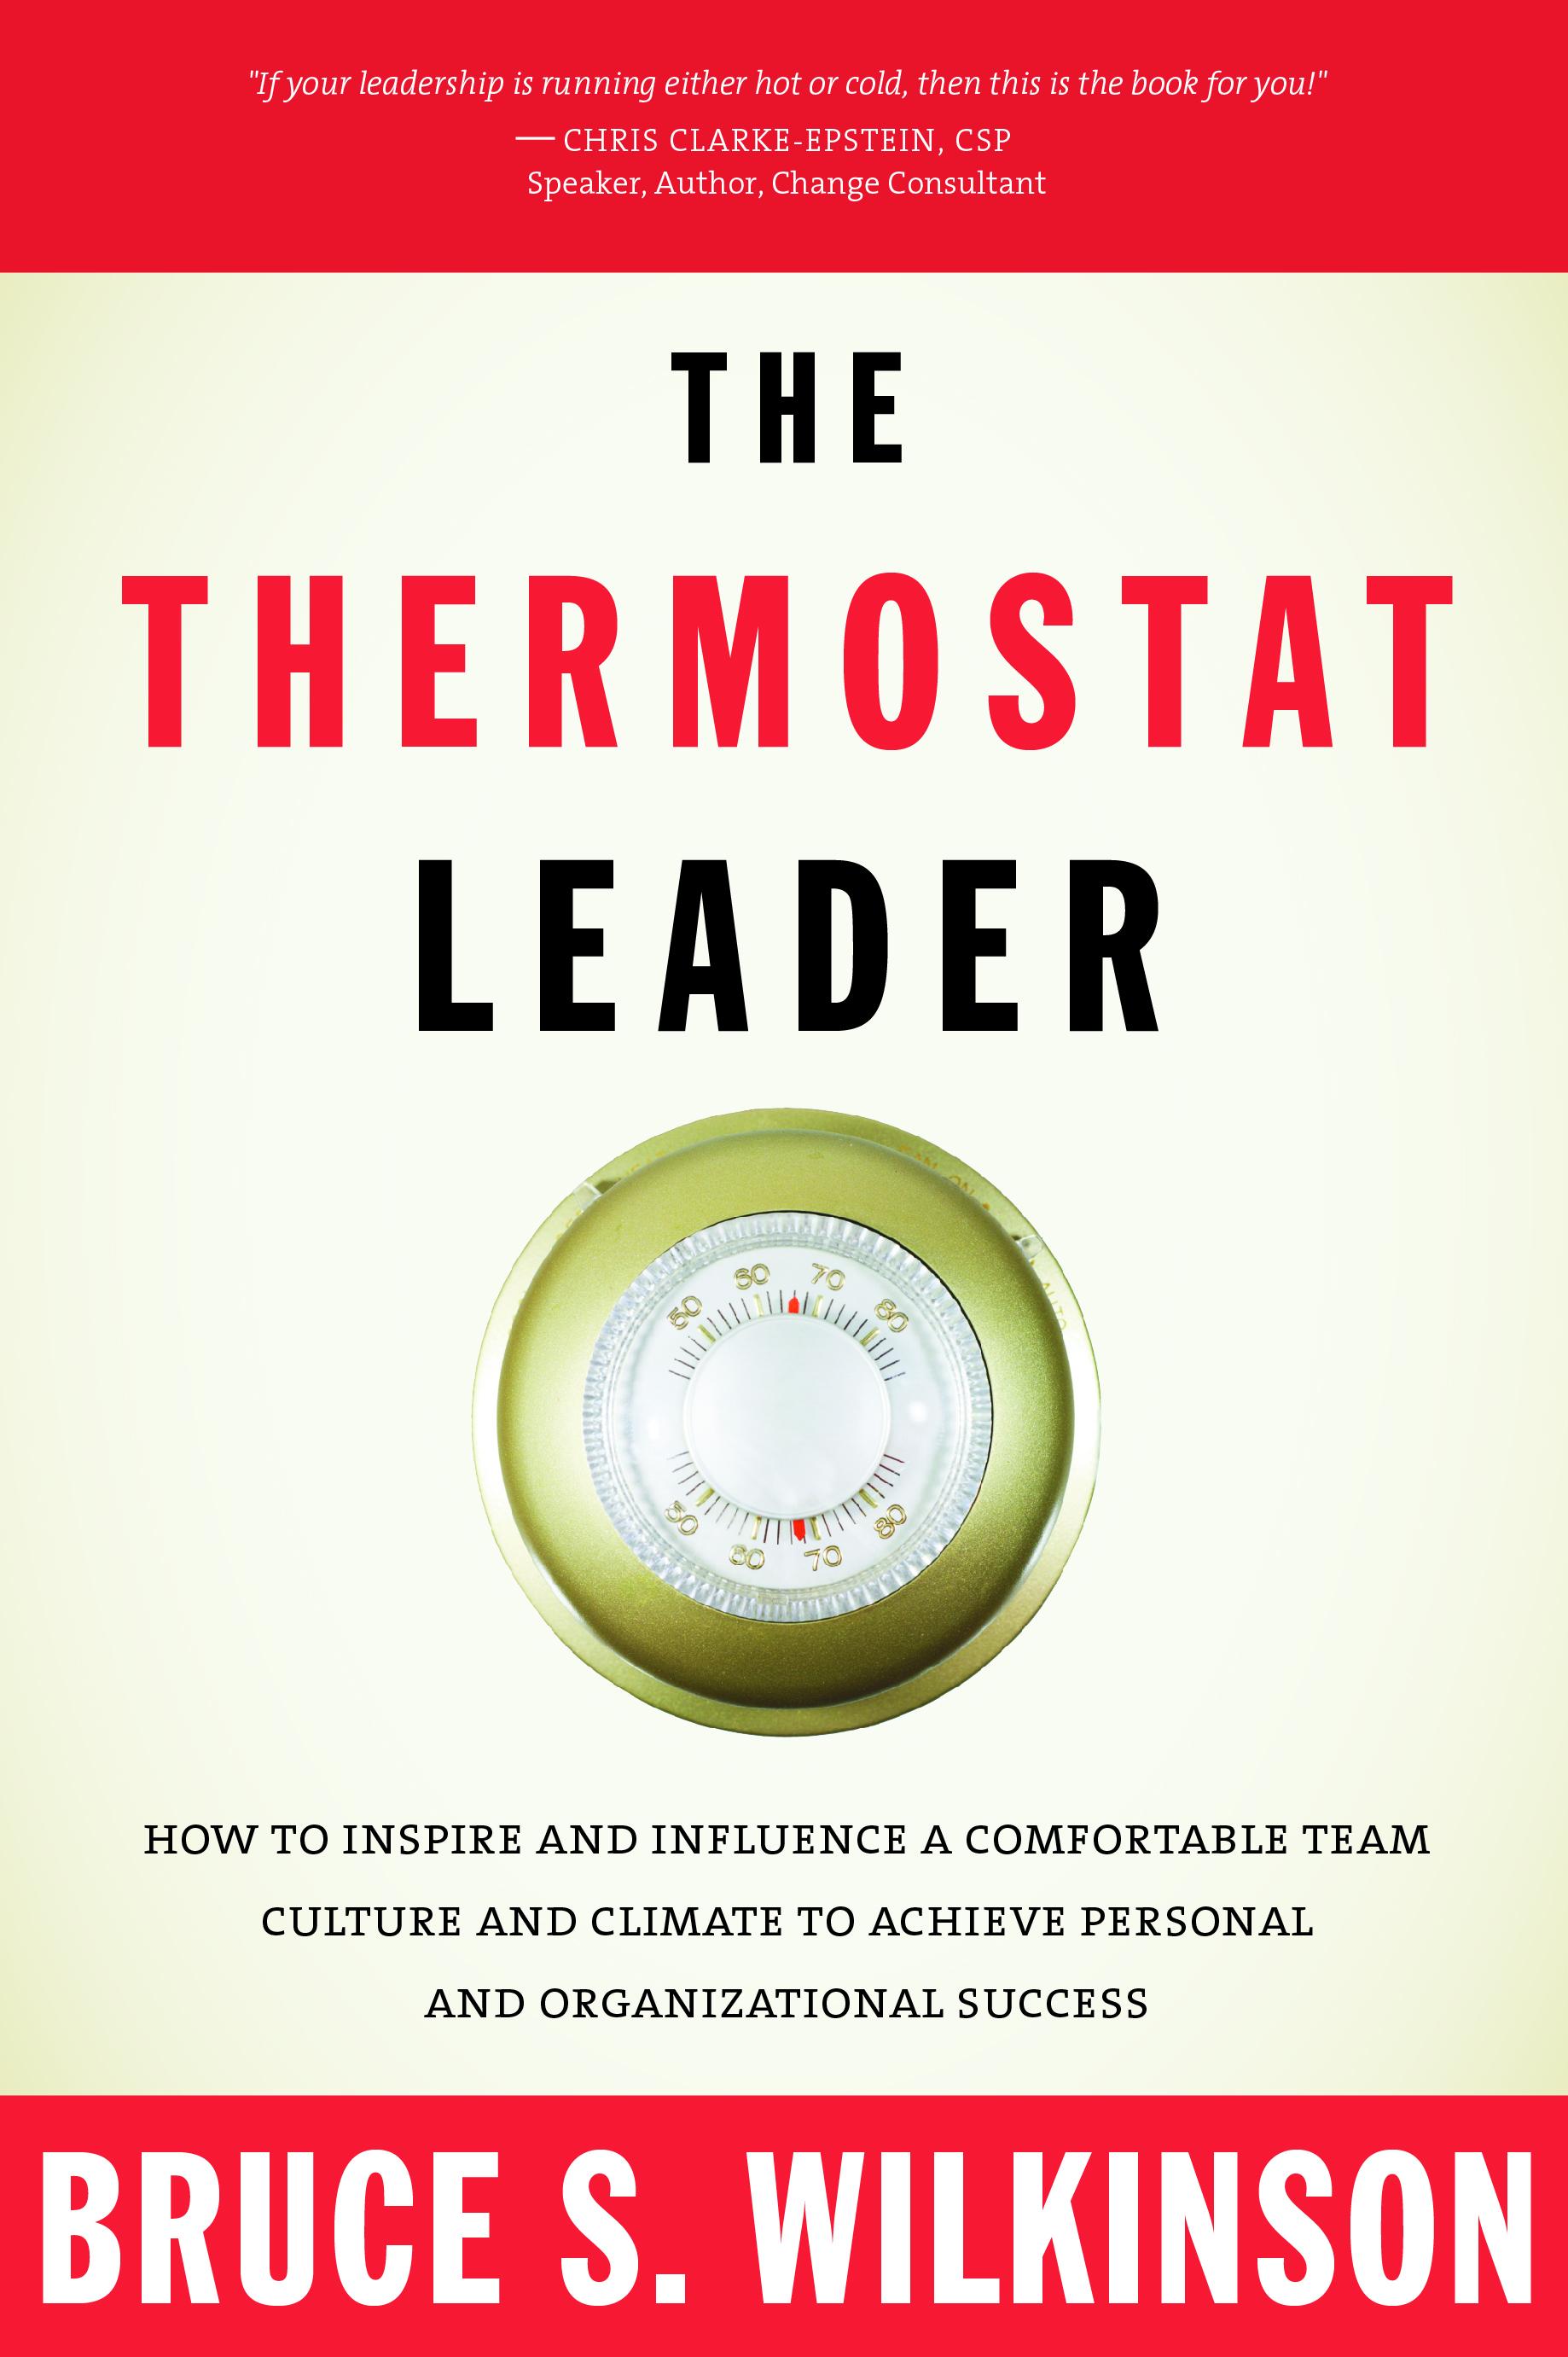 The Termostat Leader, Bruce Wilkinson